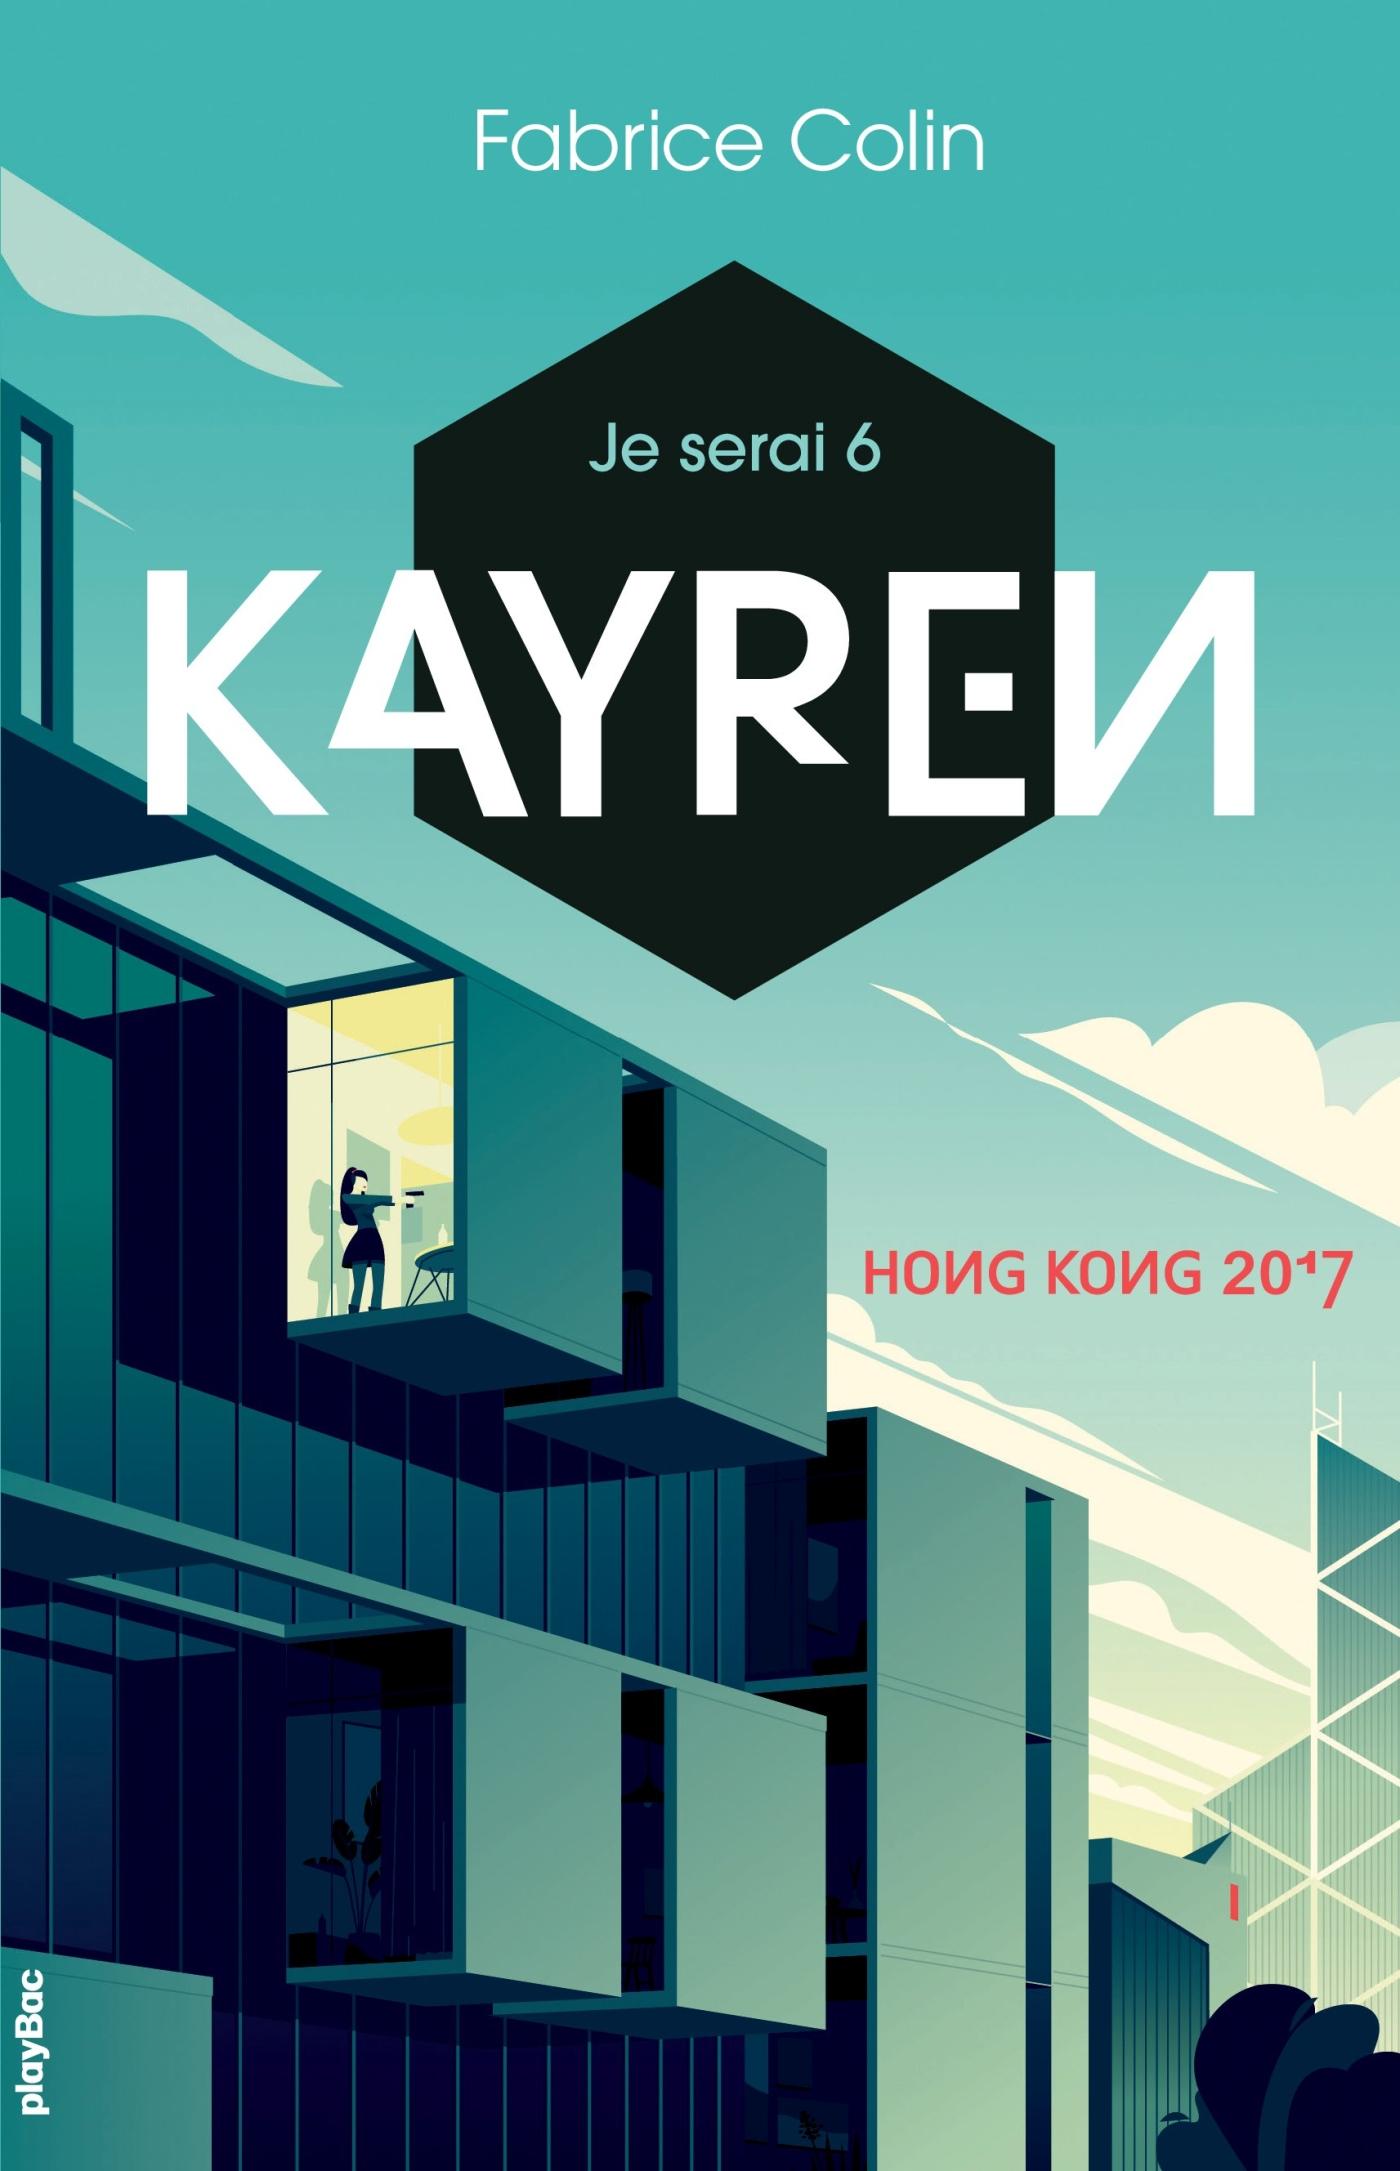 Je serai 6 - Kayren, Hong Kong 2017 | Colin, Fabrice